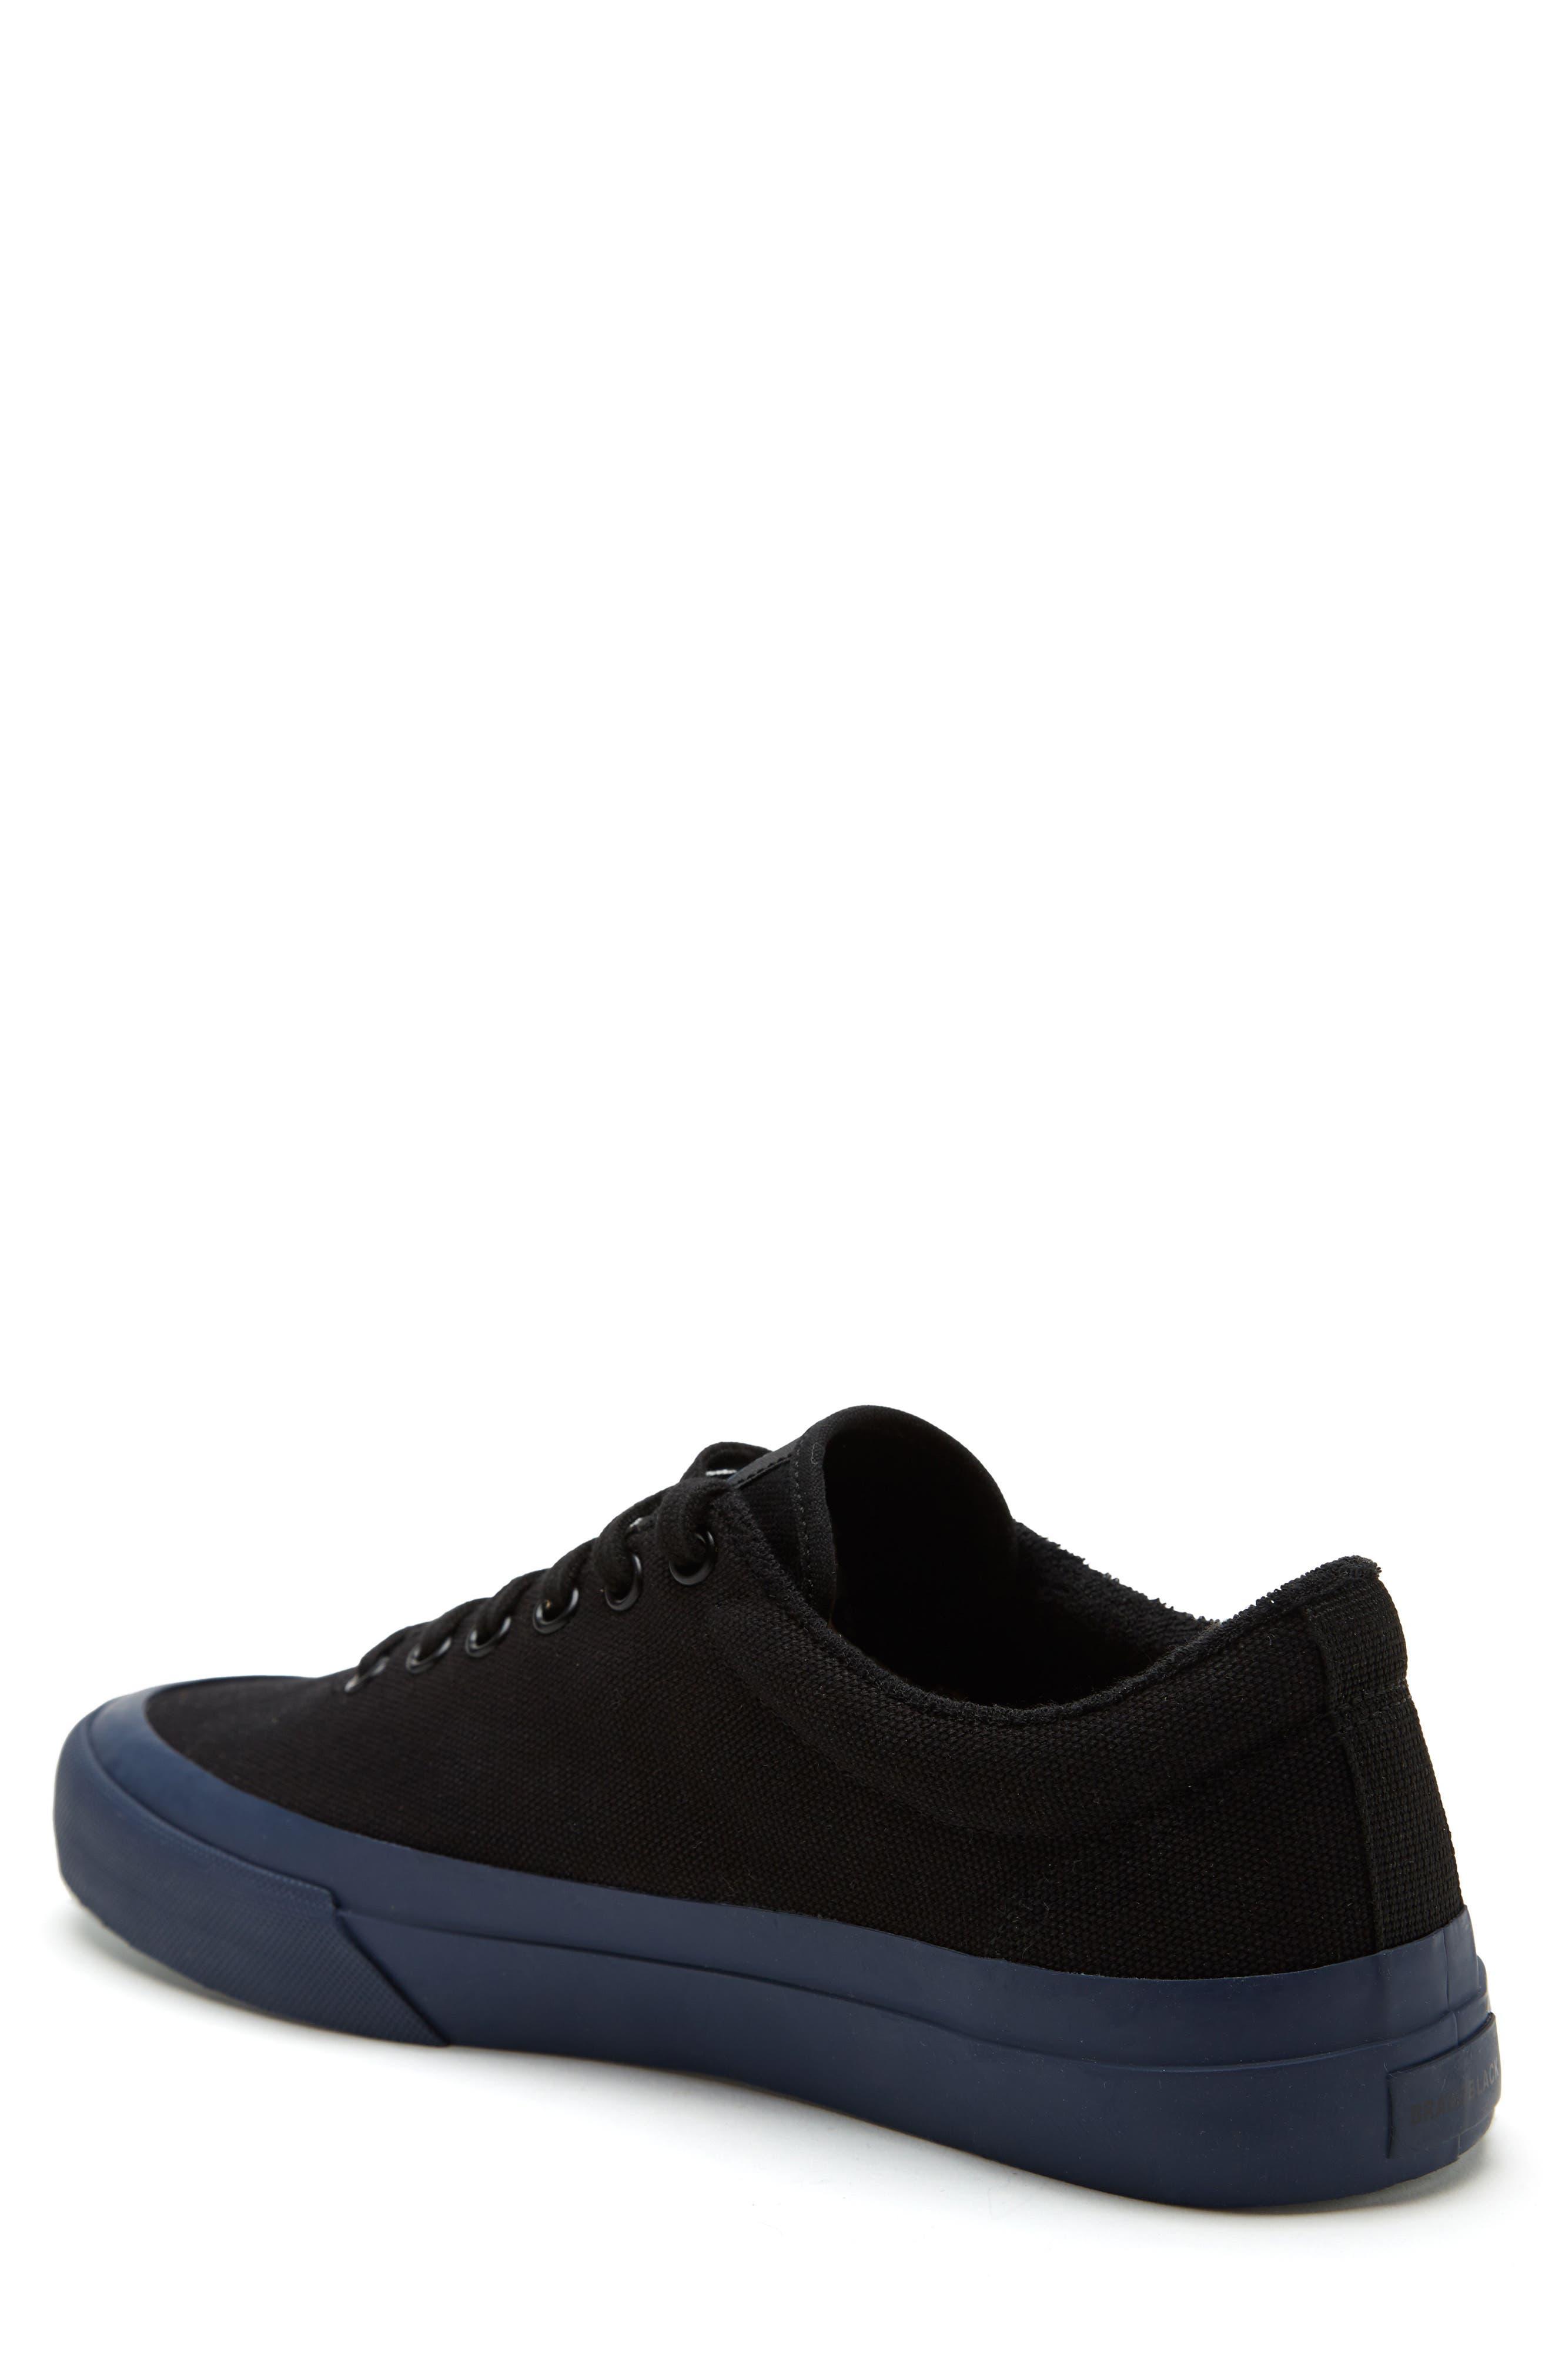 Vesta Low Top Sneaker,                             Alternate thumbnail 2, color,                             BLACK/ NAVY